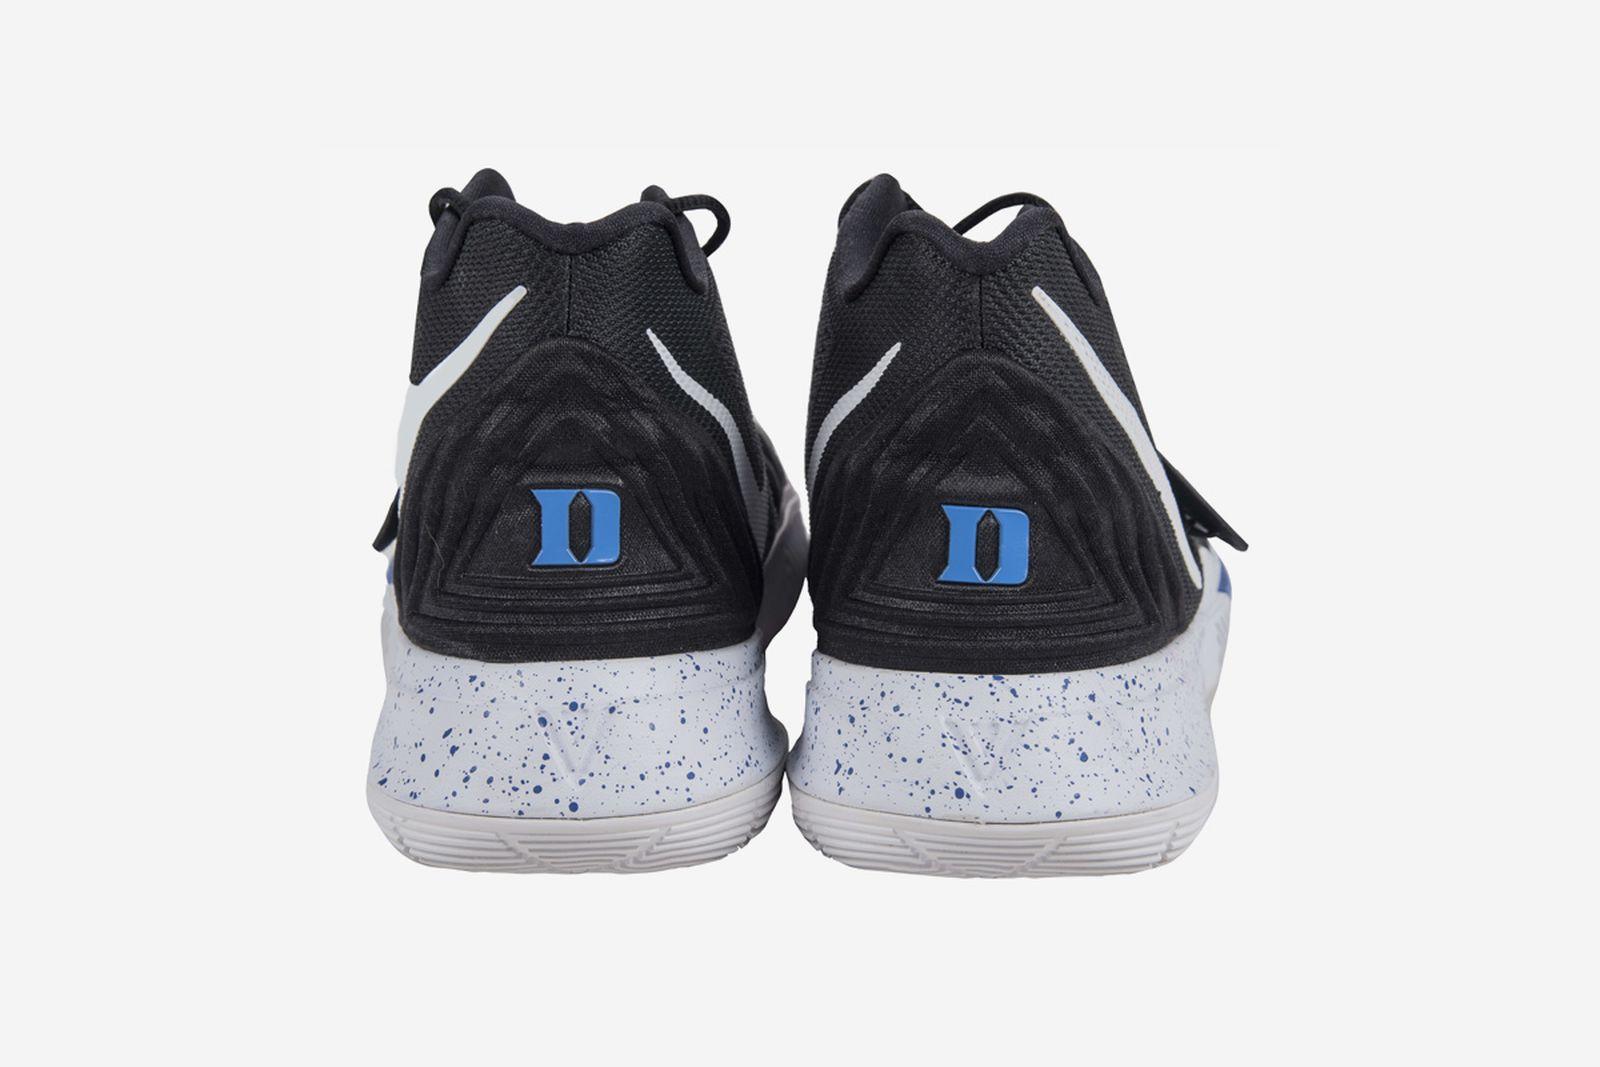 zion williamson game worn shoe sold 20000 Nike jordan brand